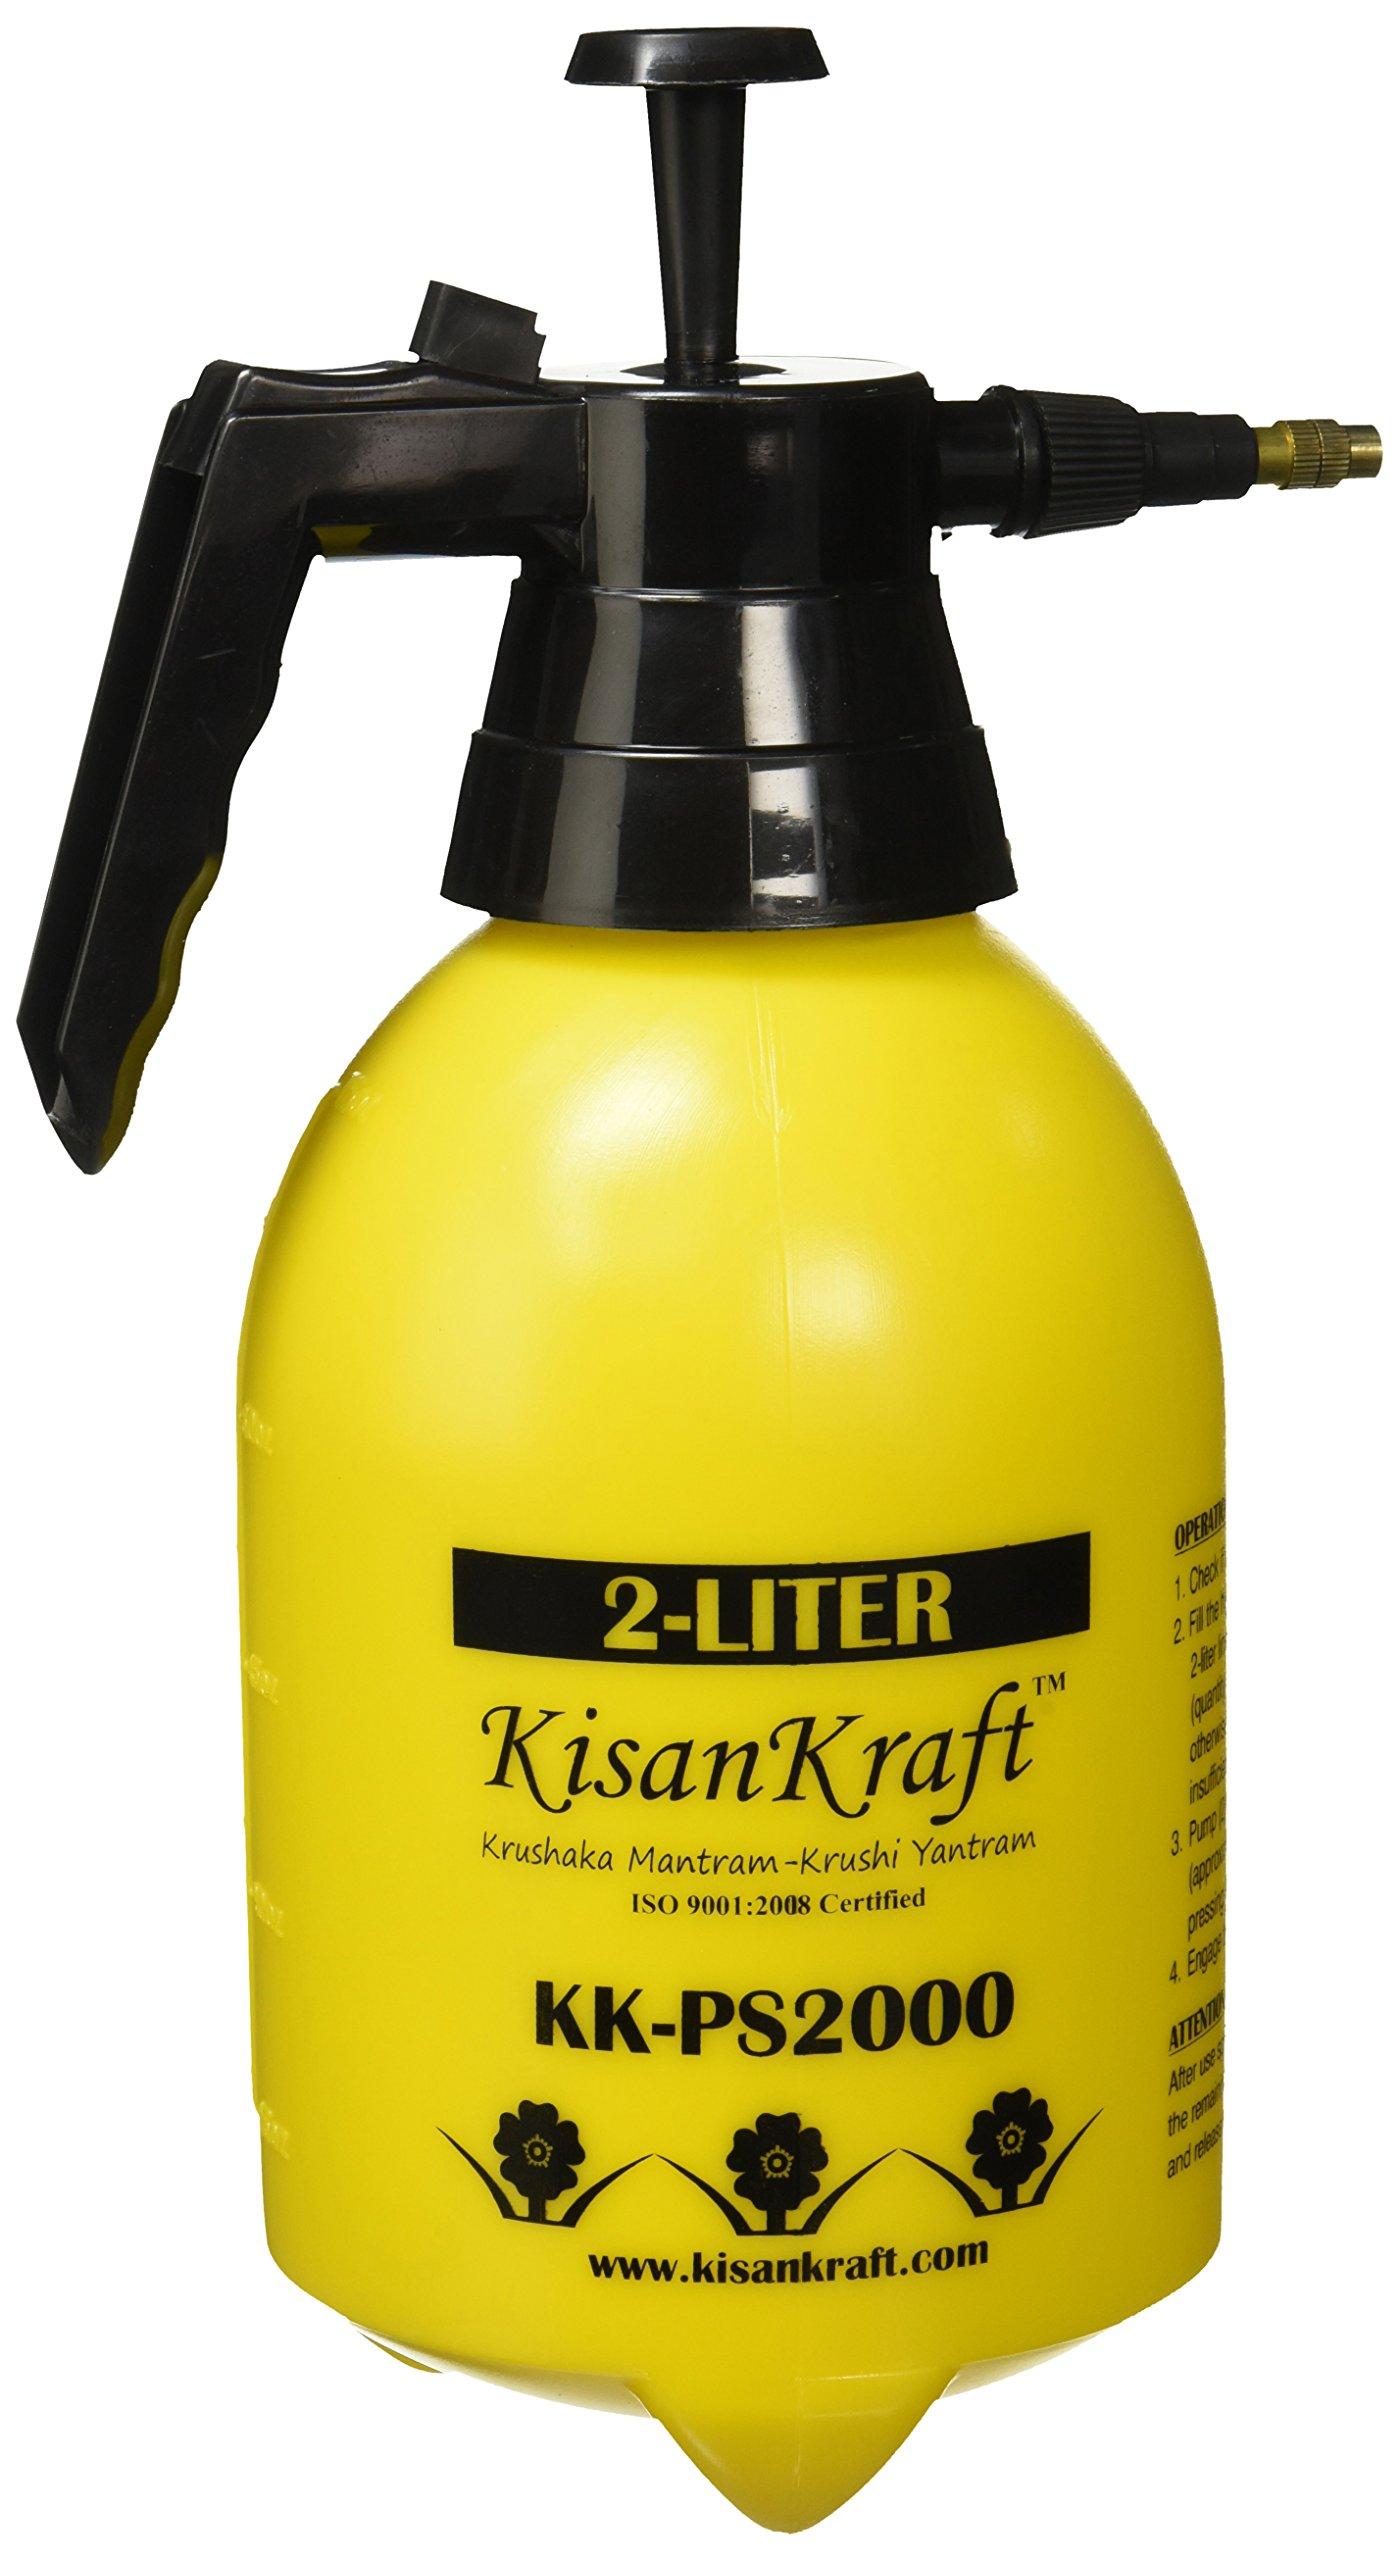 Kisan Kraft KK-PS2000 Manual Sprayer (2 Litre) (Color May Vary) product image